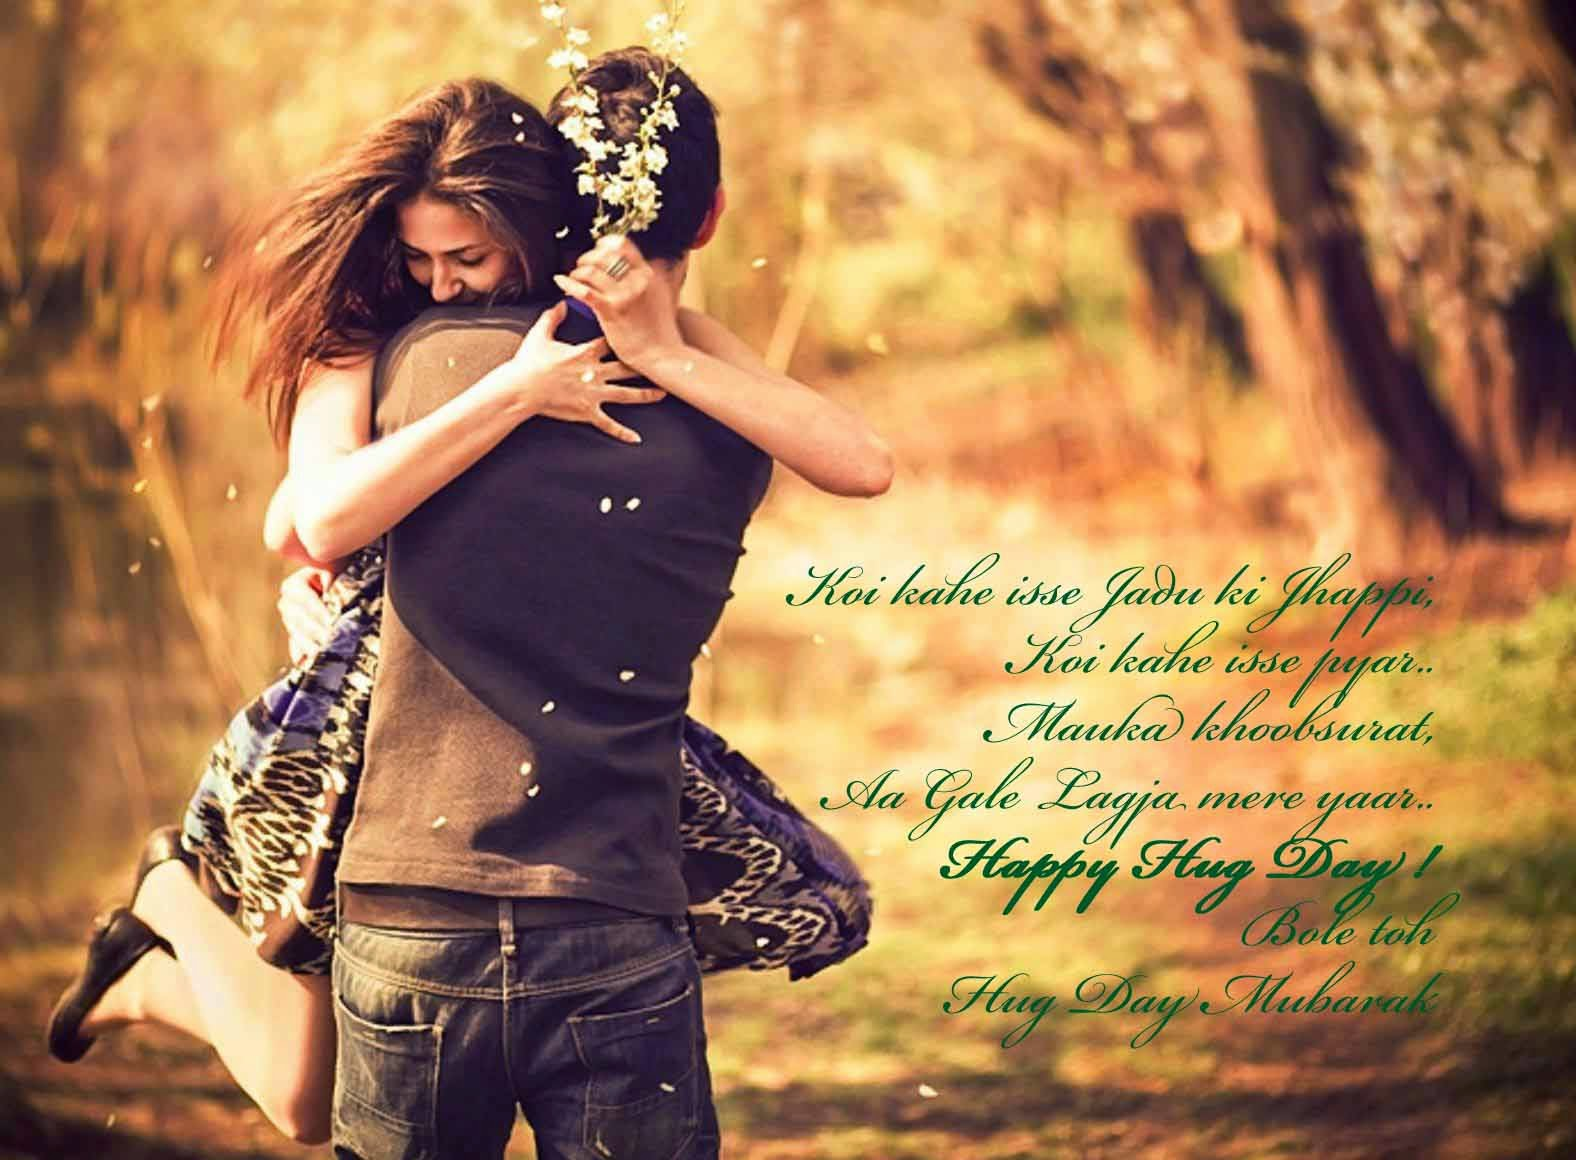 Happy Hug Day 2015